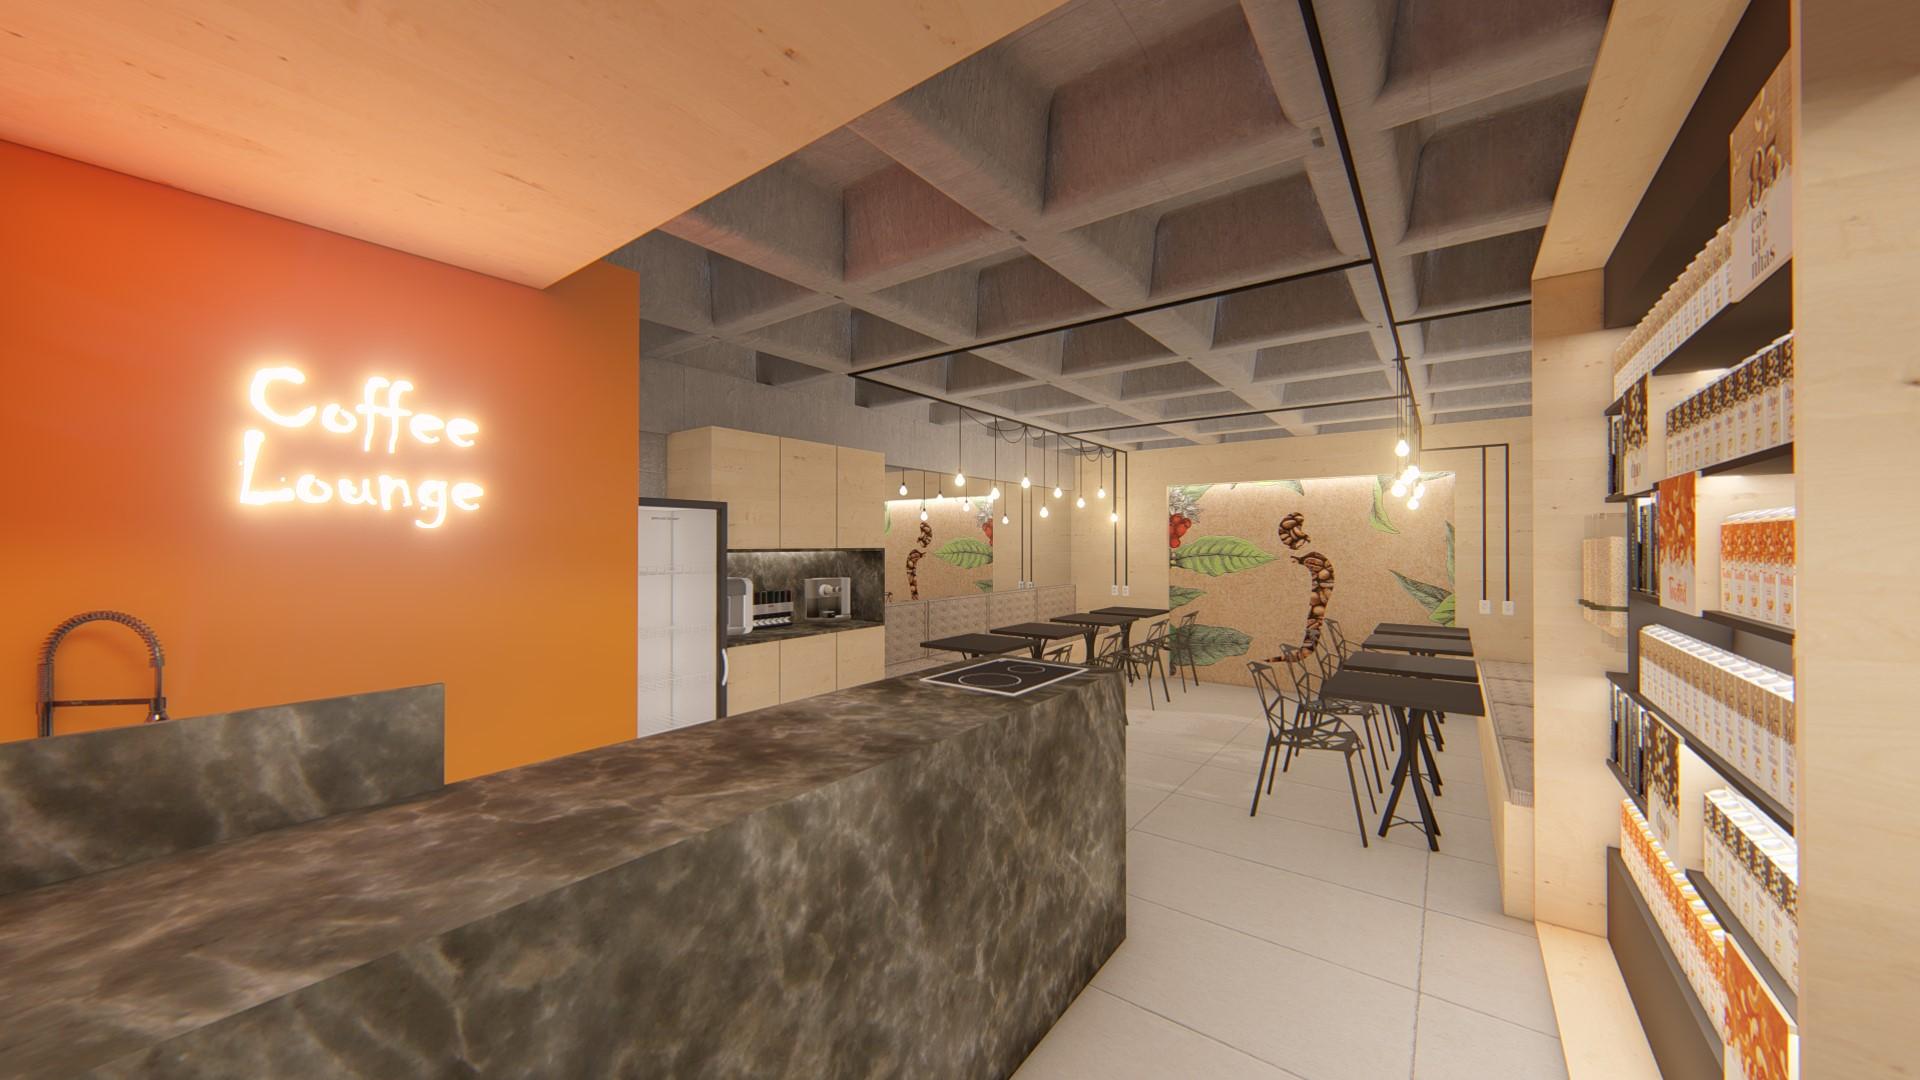 projeto-arquitetonico-cajueiro-duo-arquitetura-08.jpg